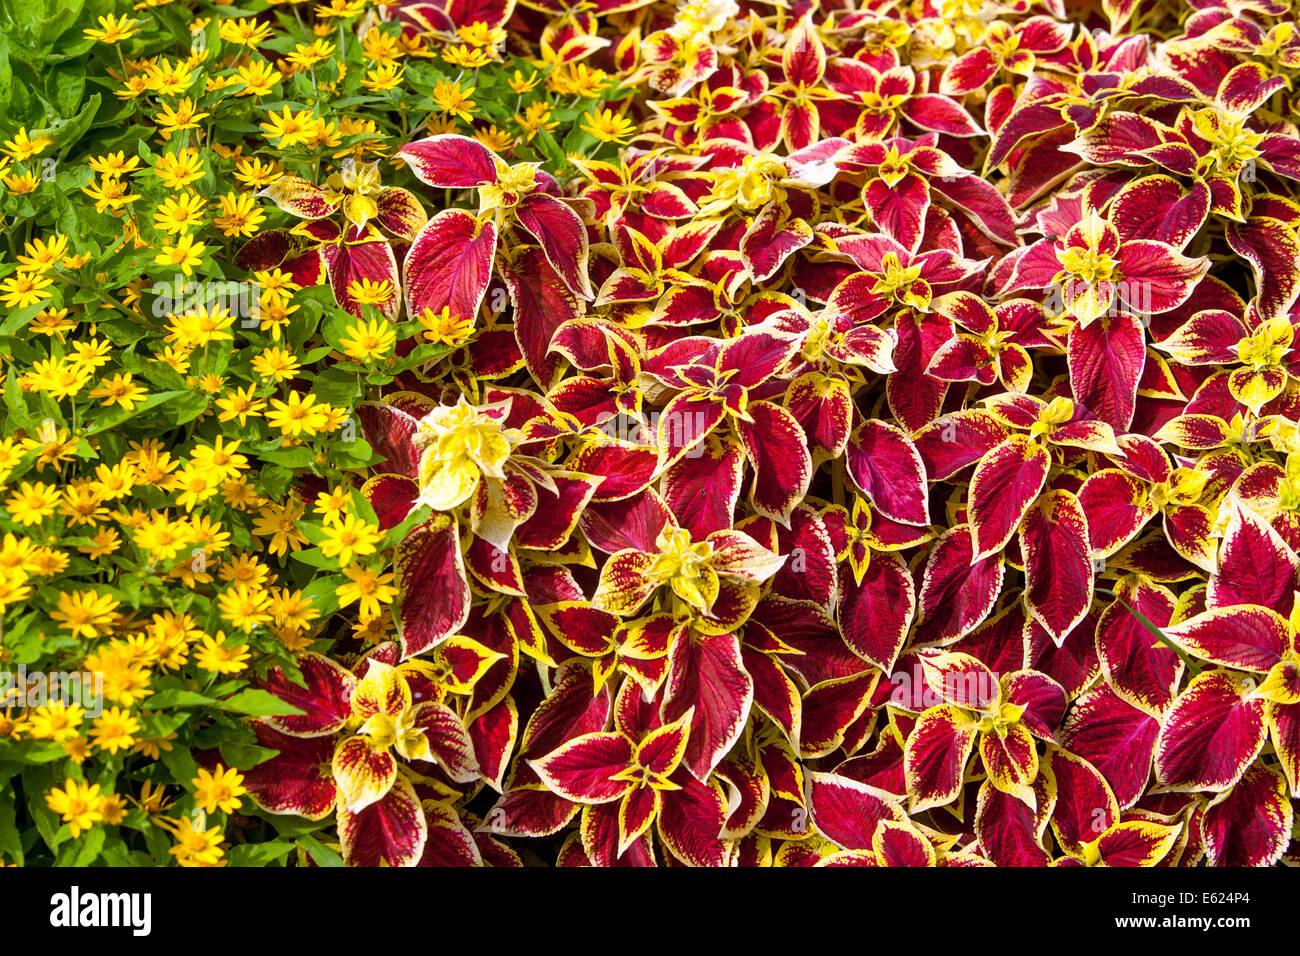 Coleus stock photos coleus stock images alamy colorful flower bed of annual flowers coleus blumel wizard scarlet melampodium izmirmasajfo Image collections